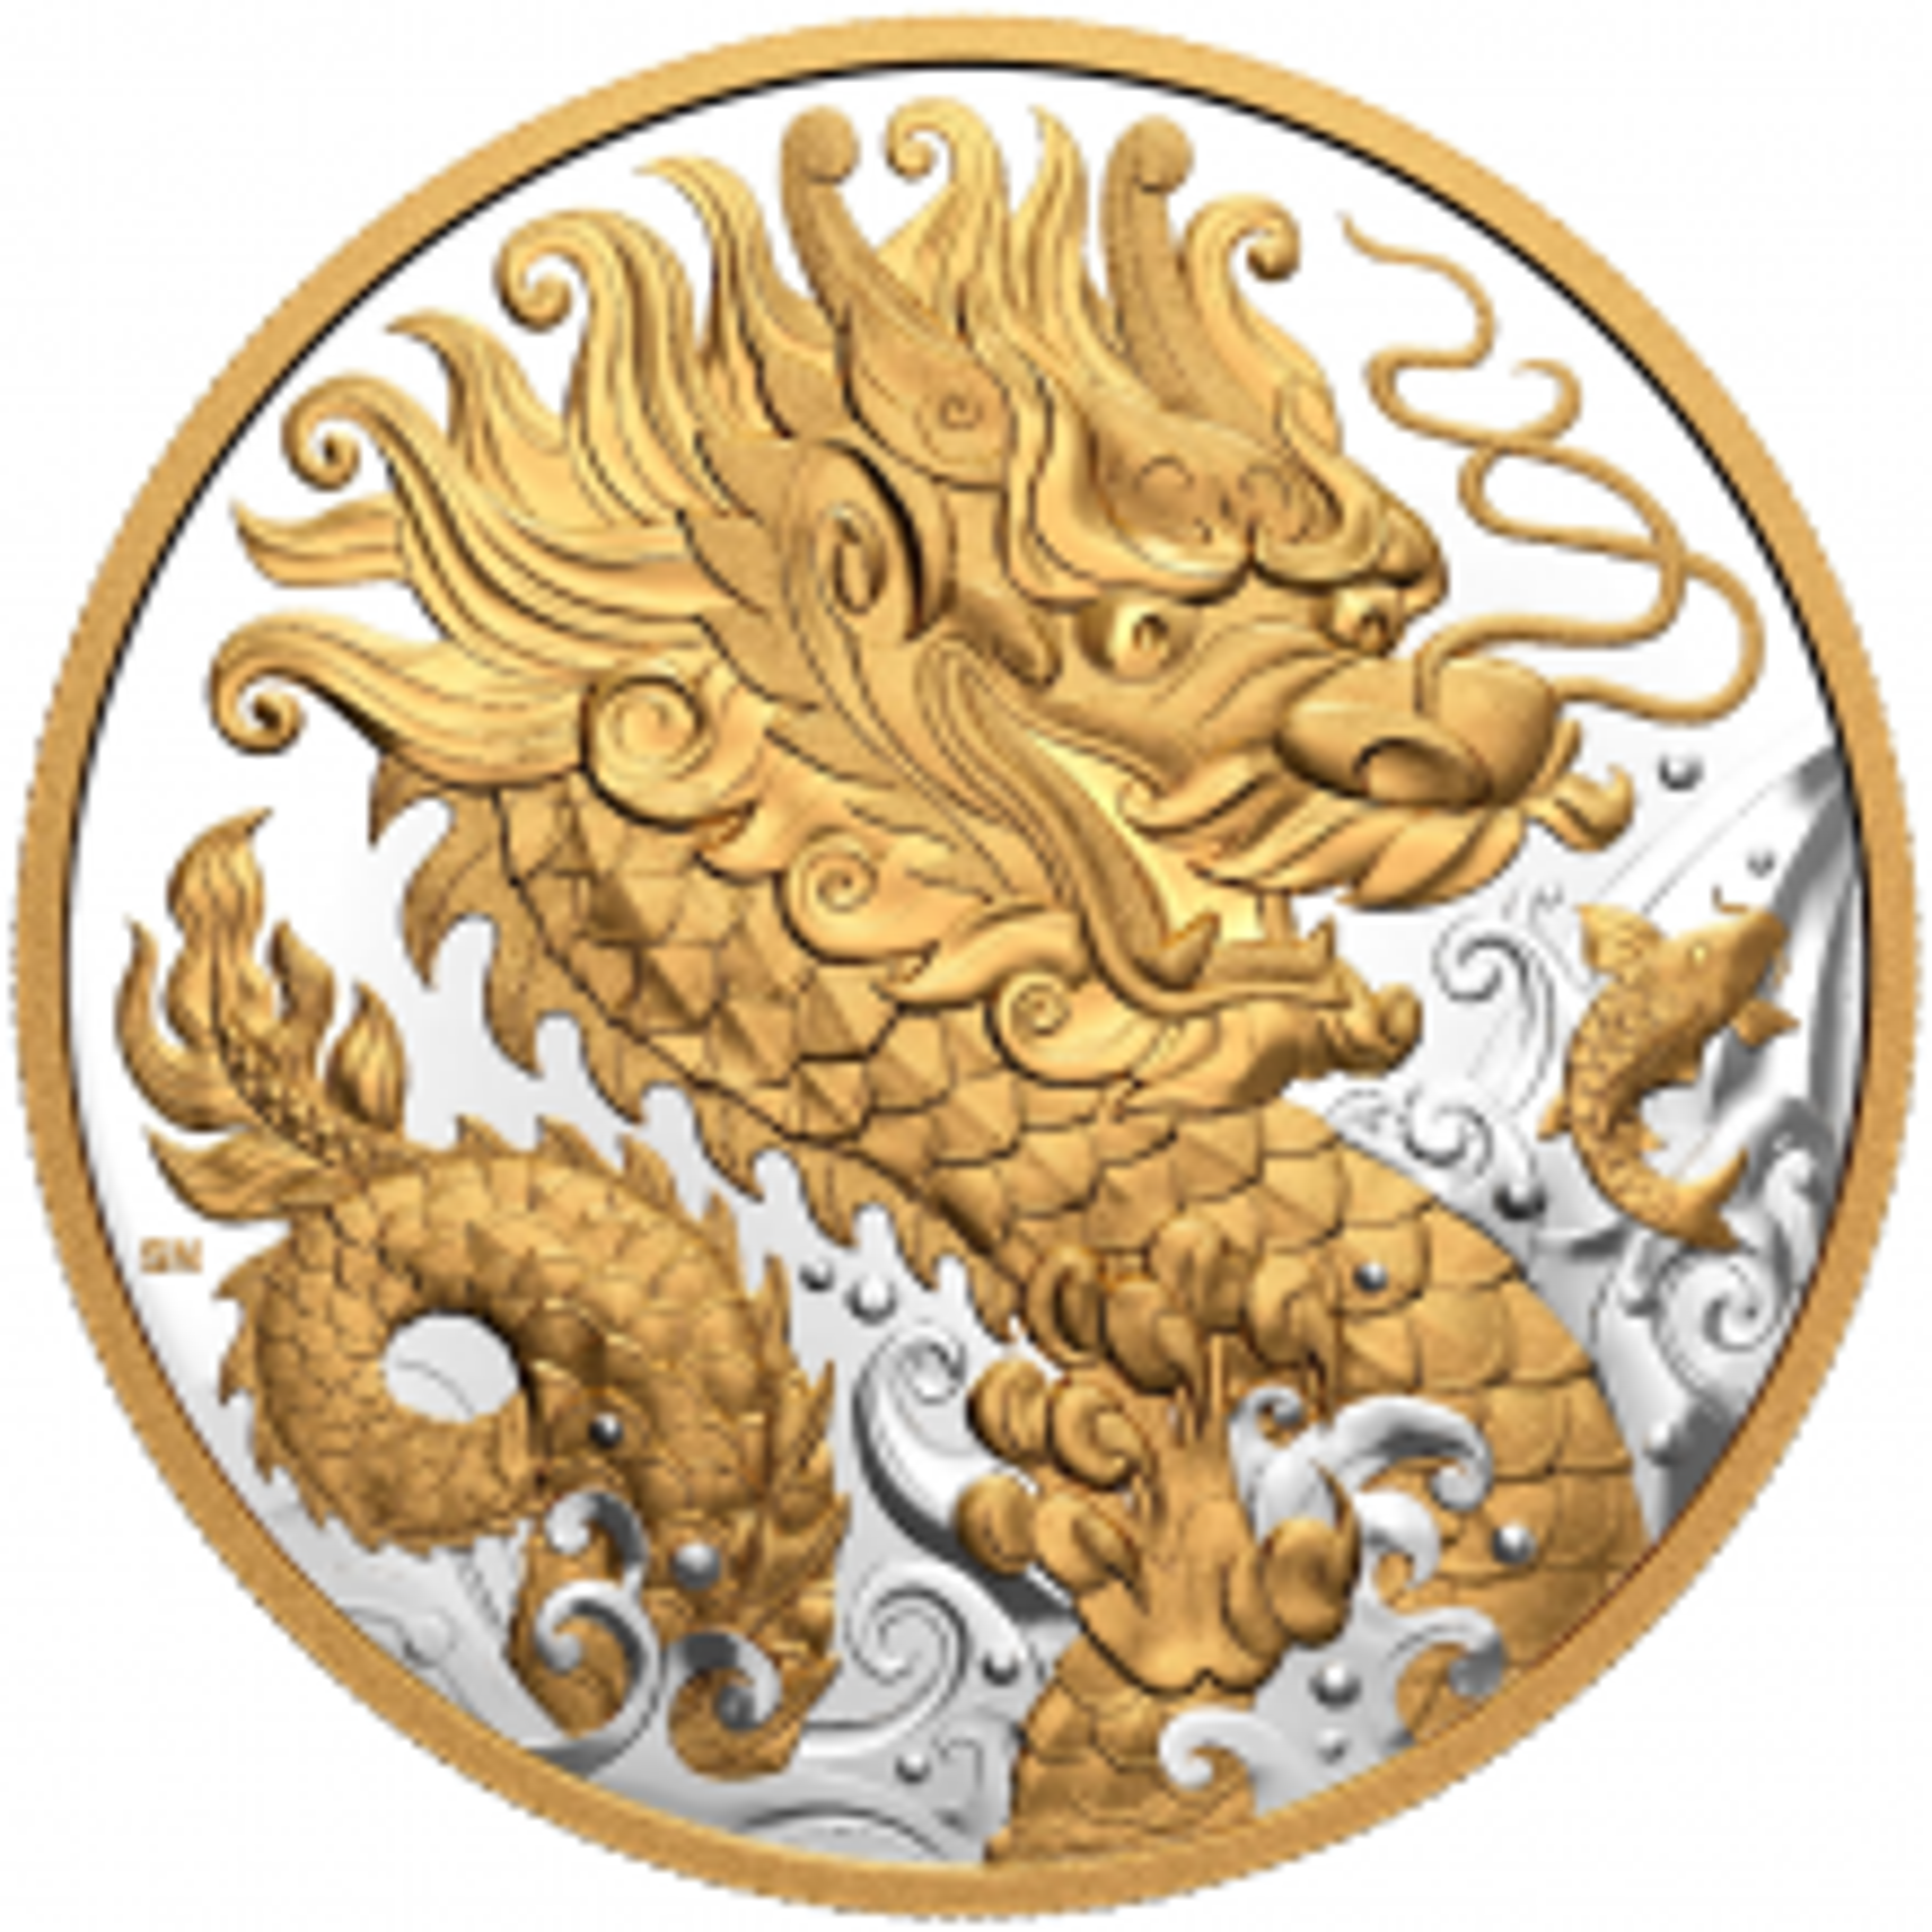 Silver coin Triumphant Dragon 2021 Proof